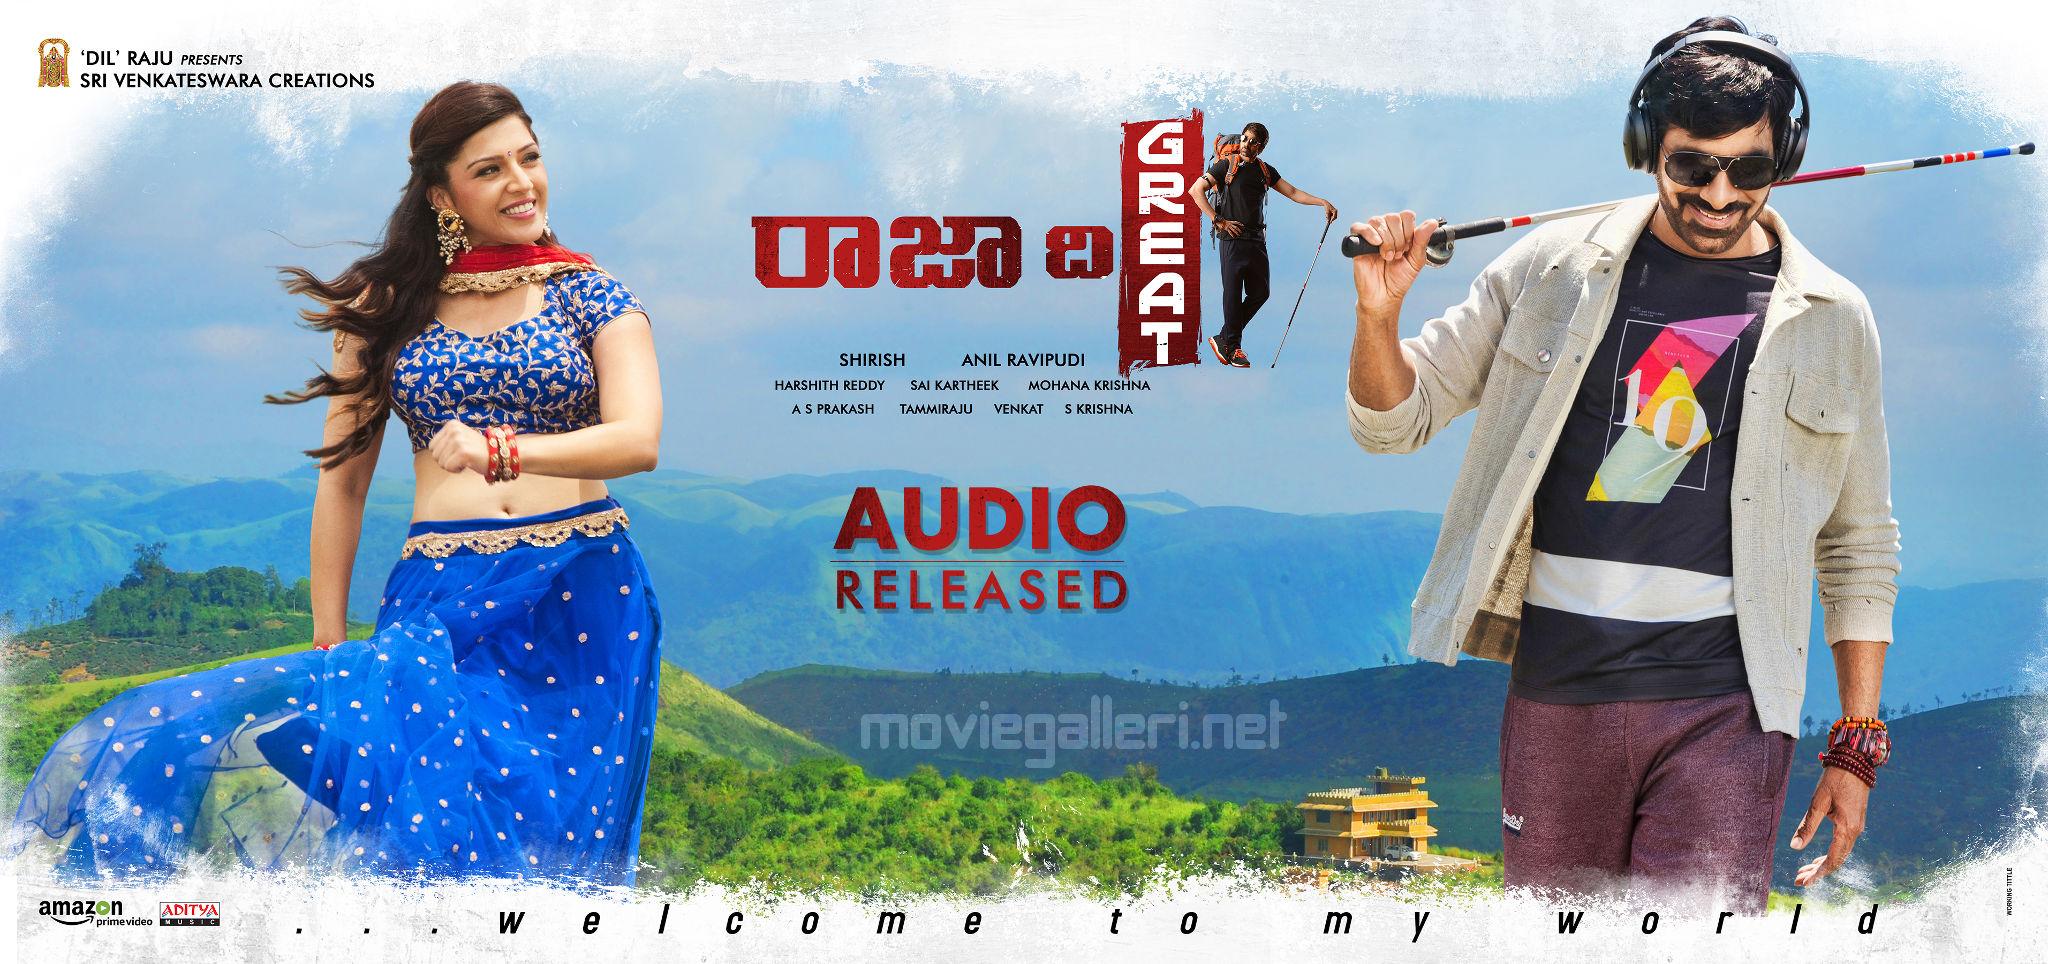 Mehreen Pirzada Ravi Teja Raja the Great Movie Audio Released Wallpapers